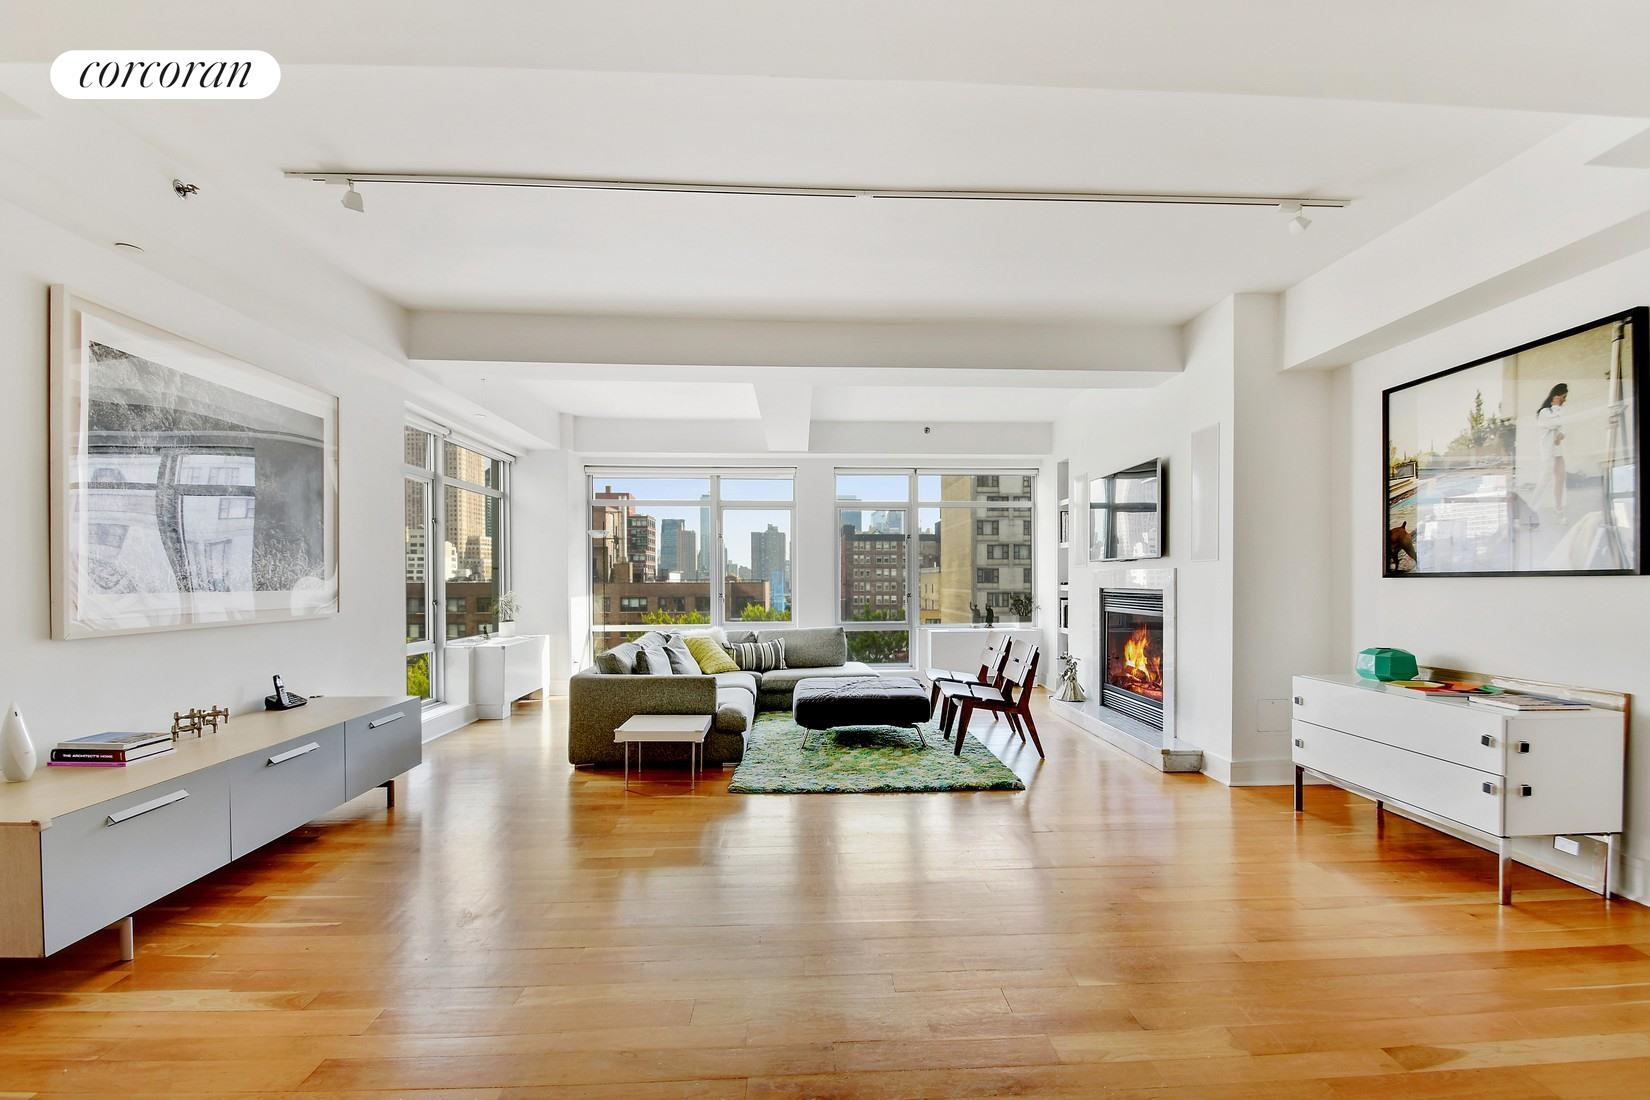 Condominium for Sale at West 58, 426 West 58th Street Ph1/Ph2 426 West 58th Street New York, New York 10019 United States